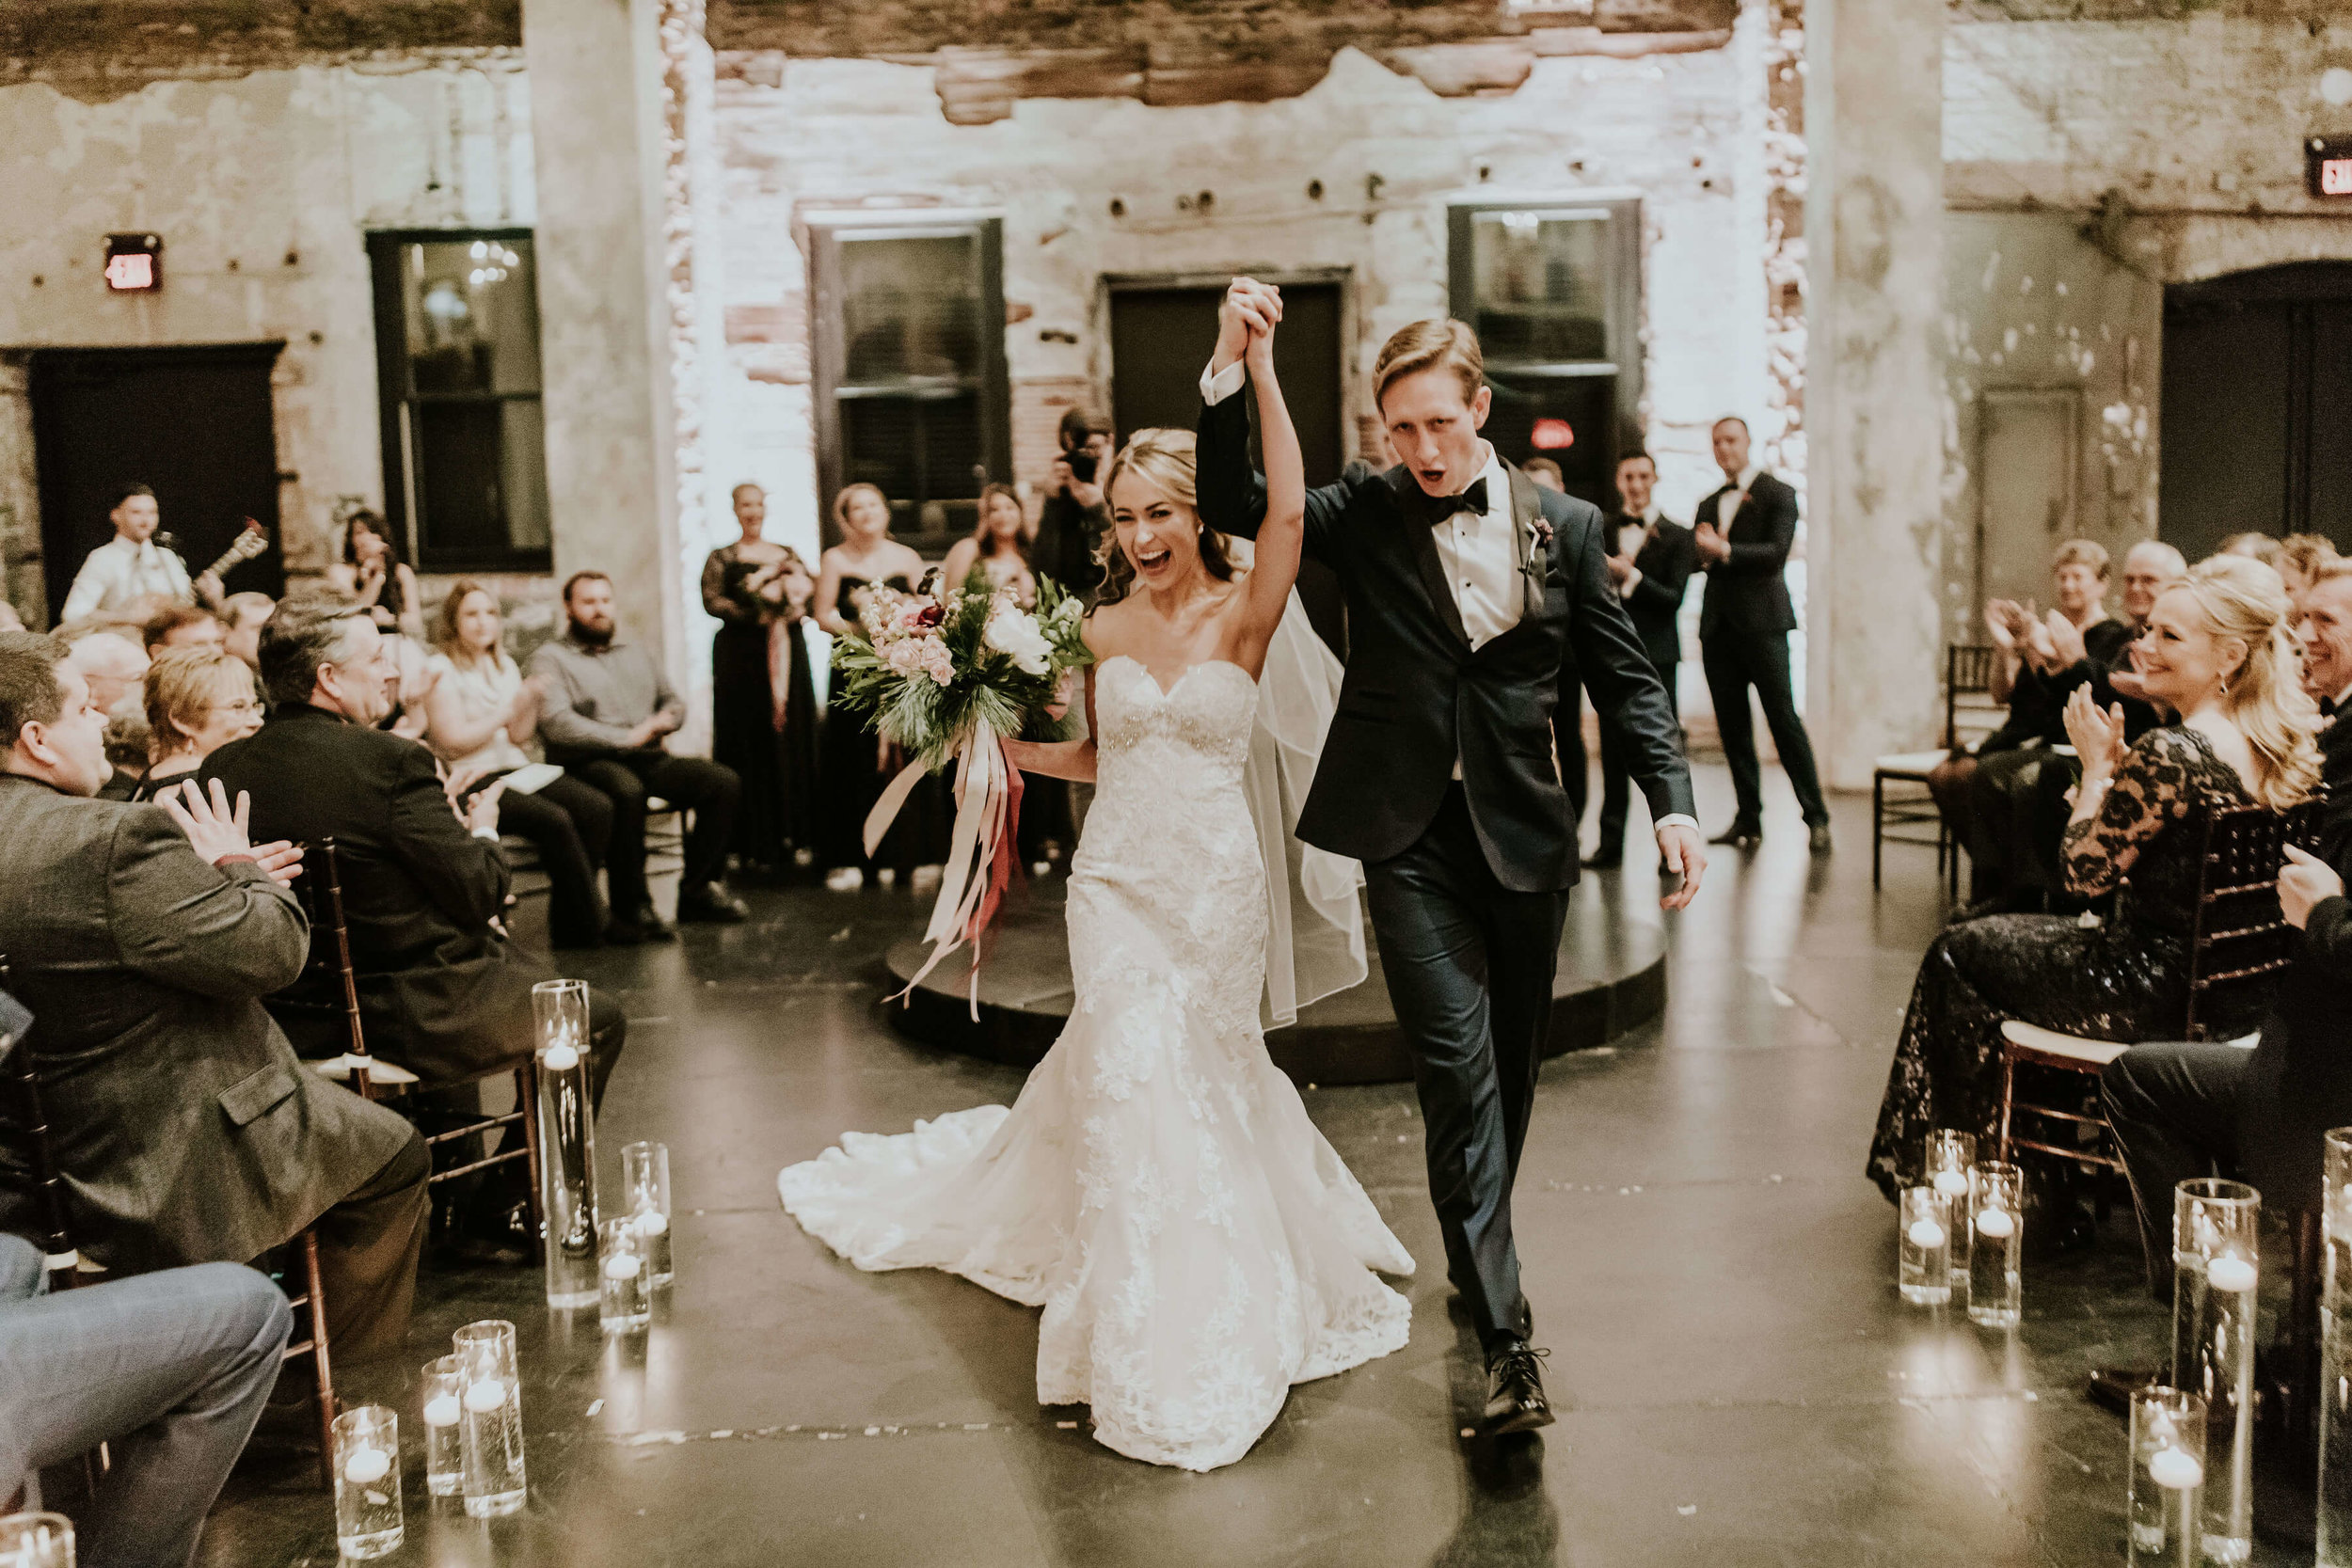 Kim+Greg_Jordan_Wedding_Aria_Russell_Heeter_Photography-491.jpg